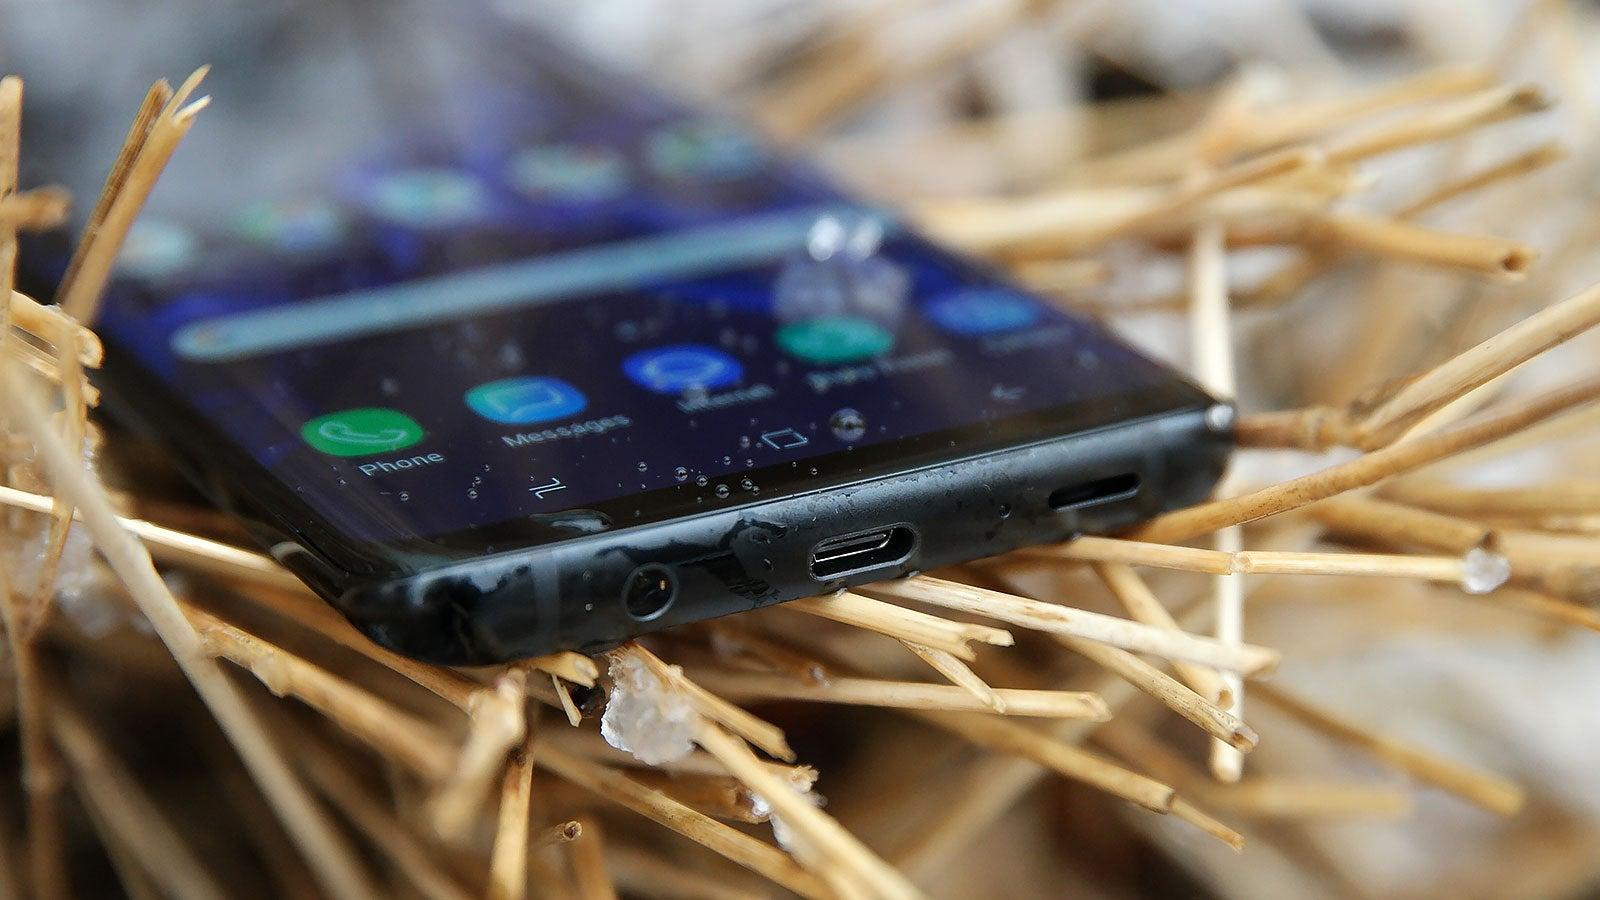 The Best Phones That Still Have Headphone Jacks